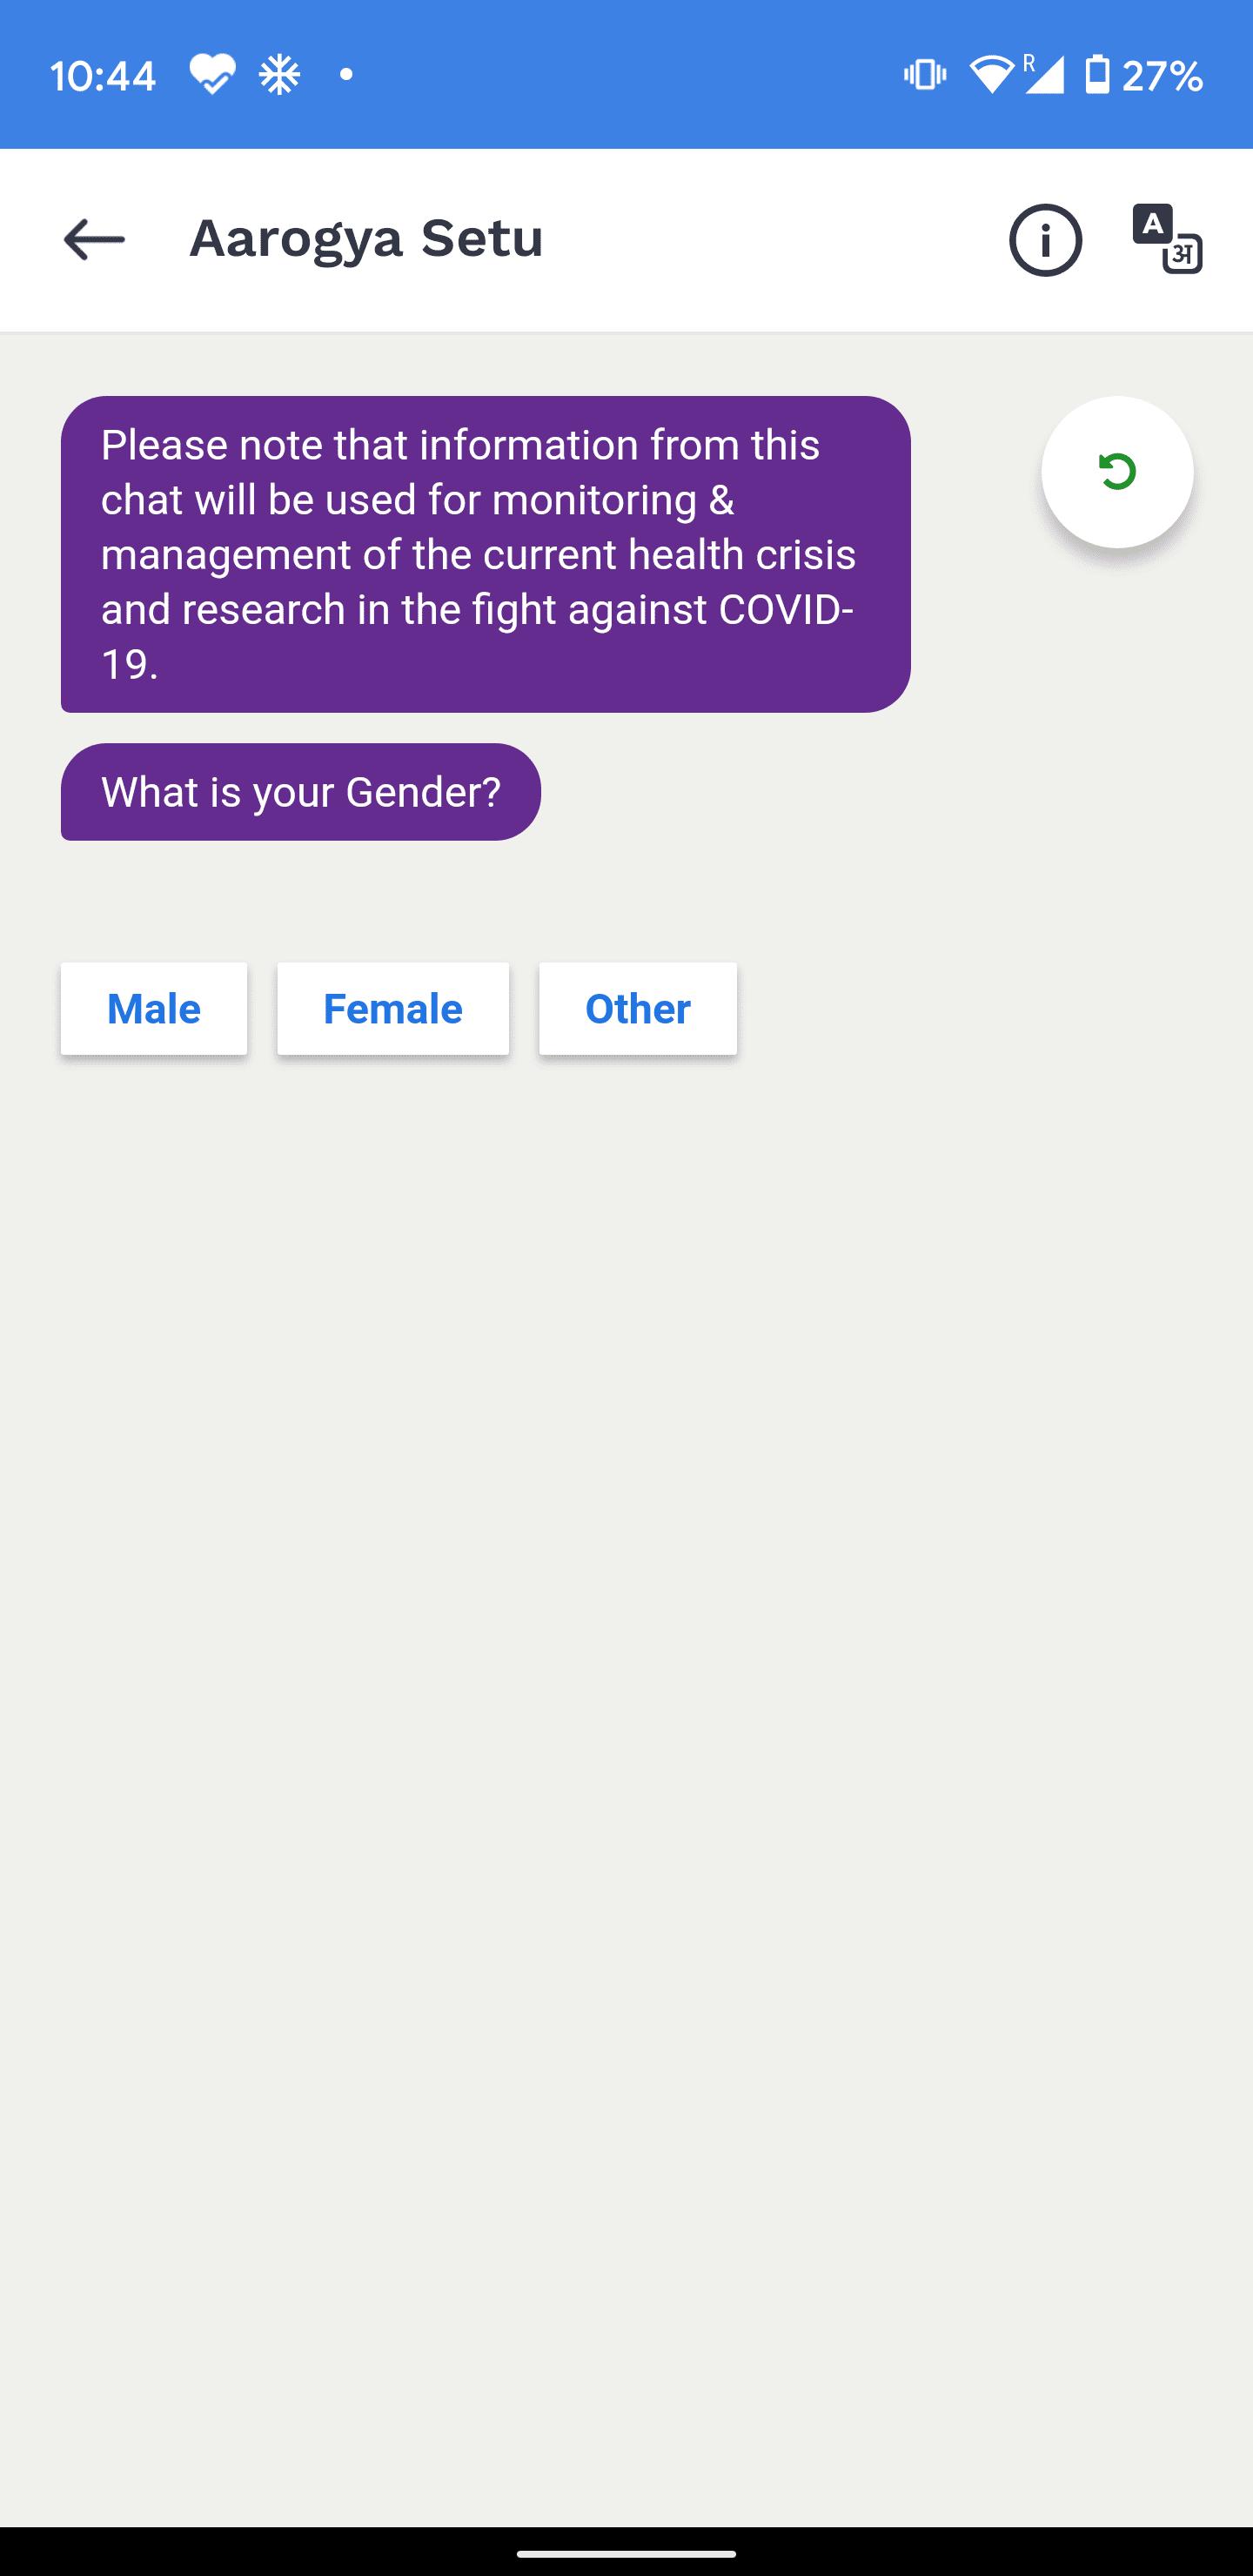 Aarogya Setu chatbot